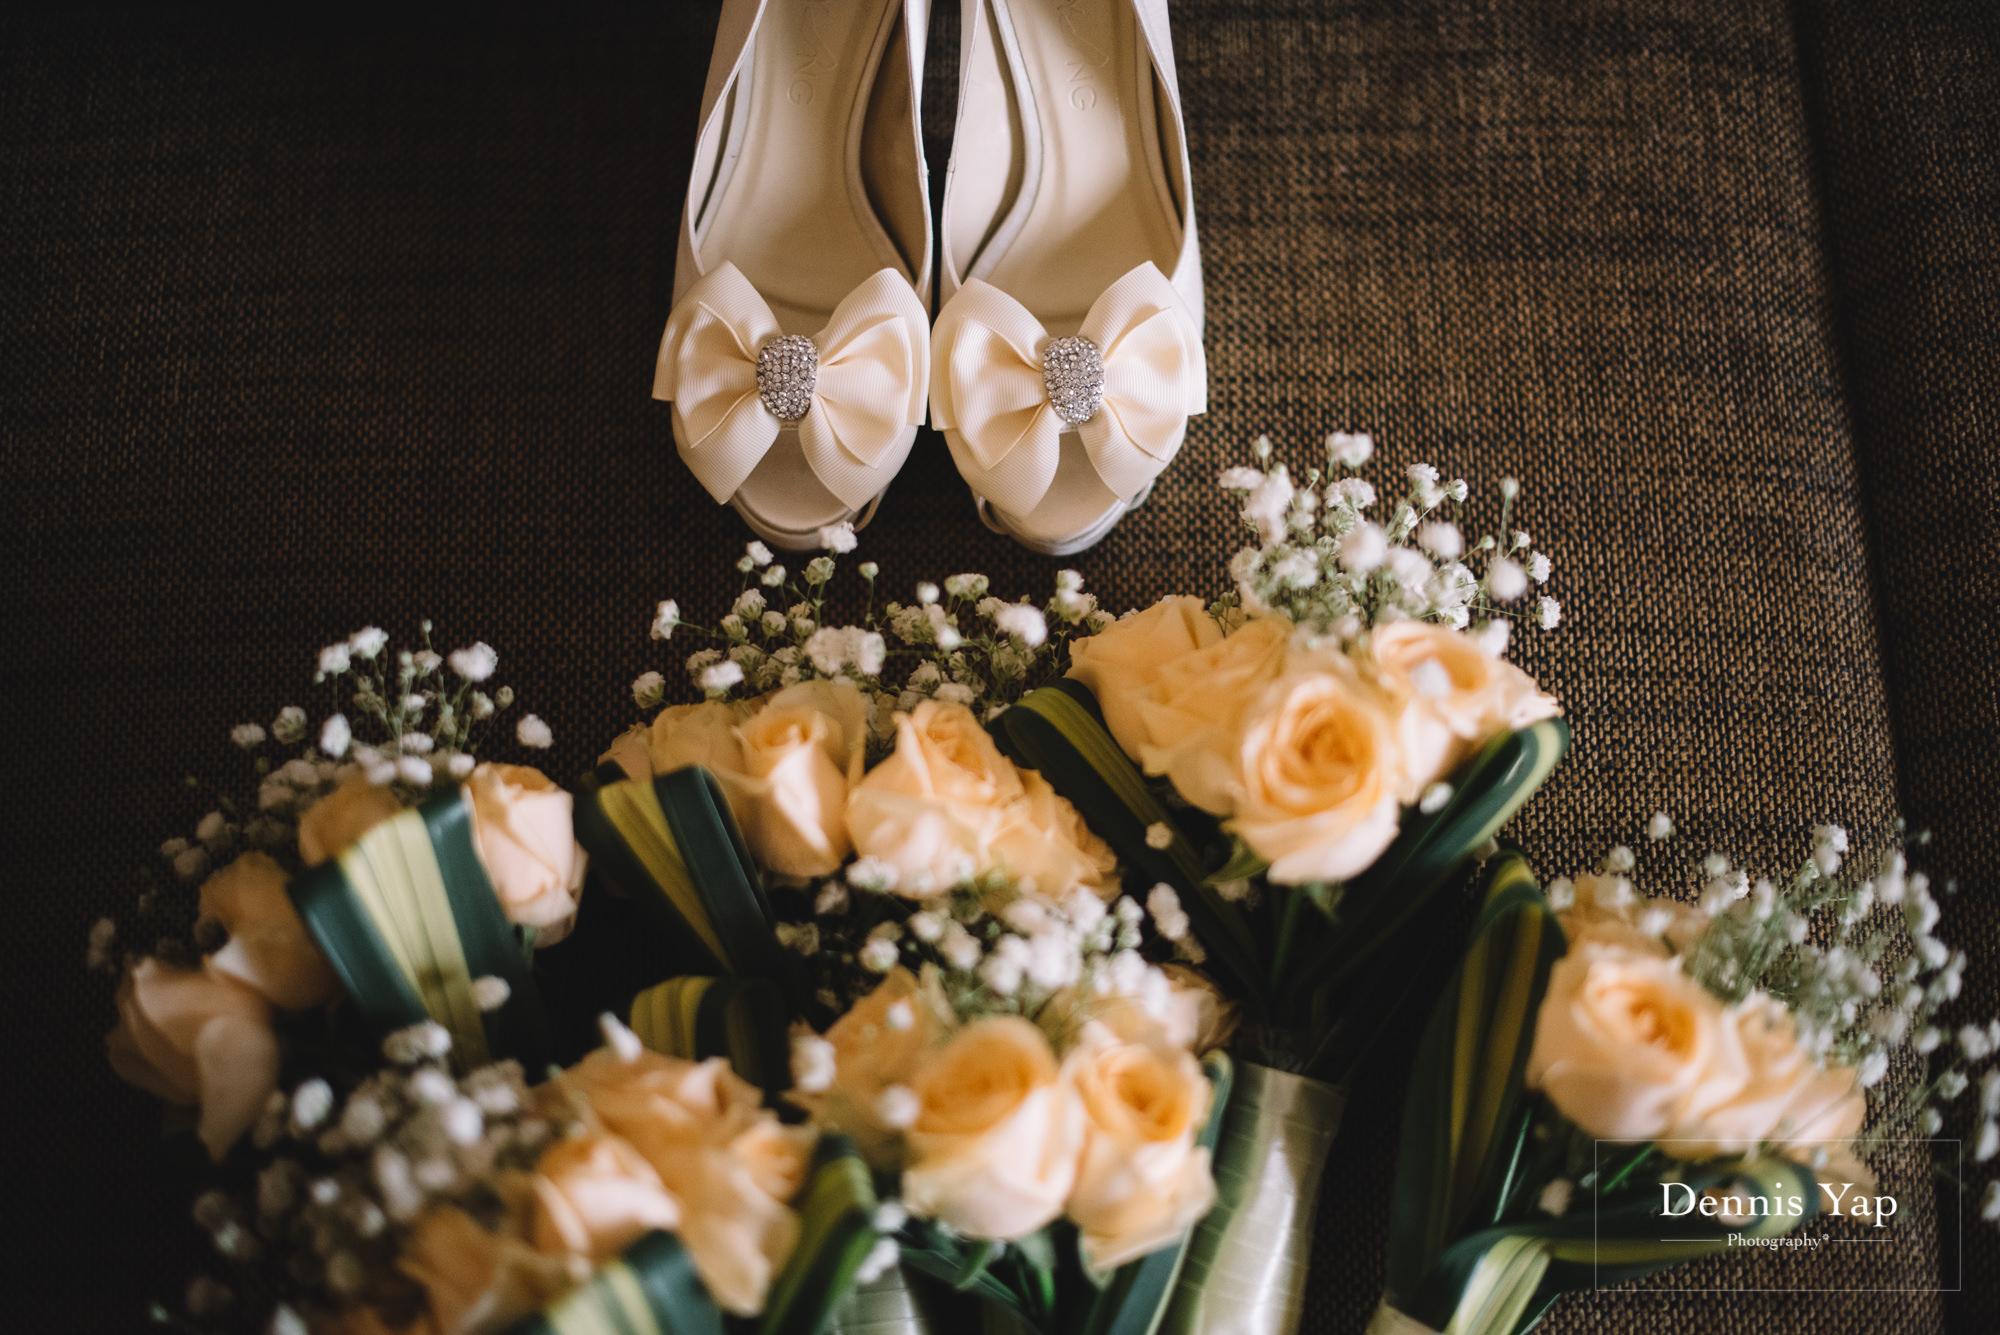 han sen ce pei wedding day A loft hotel kuala lumpur dennis yap photography-2.jpg